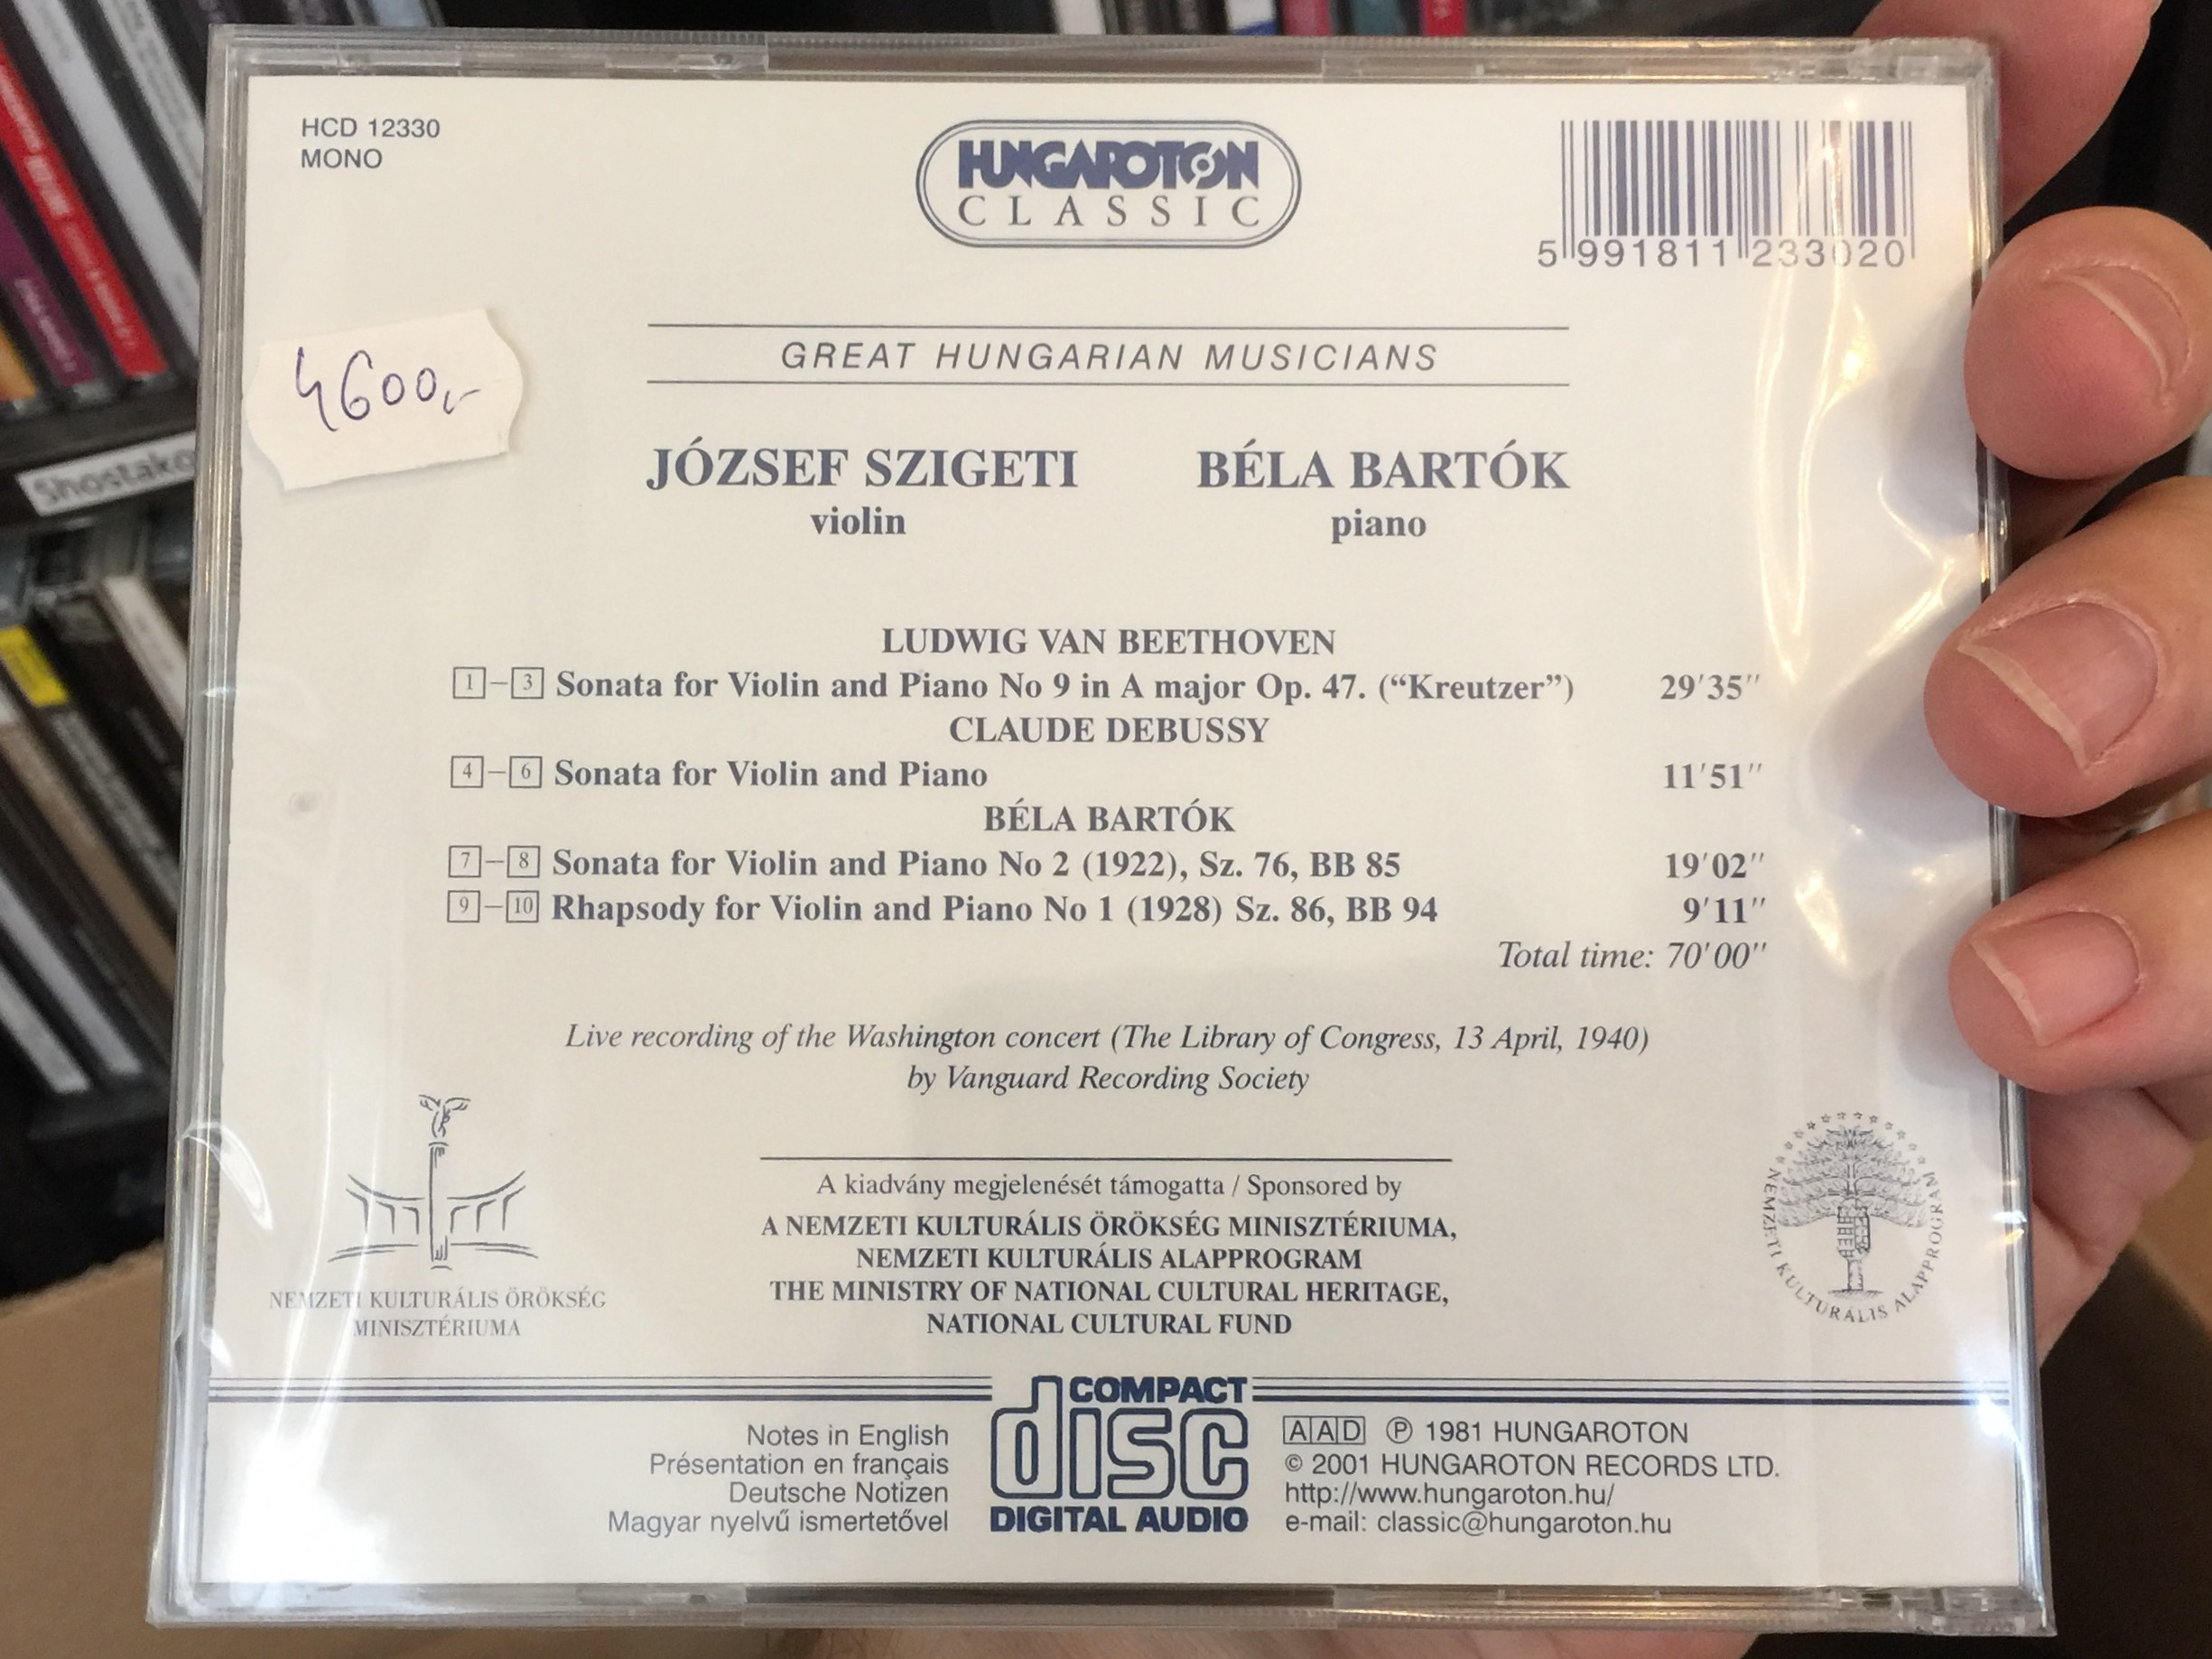 great-hungarian-musicians-beethoven-debussy-bart-k-j-zsef-szigeti-violin-b-la-bart-k-piano-hungaroton-classic-audio-cd-2001-mono-hcd-12330-2-.jpg